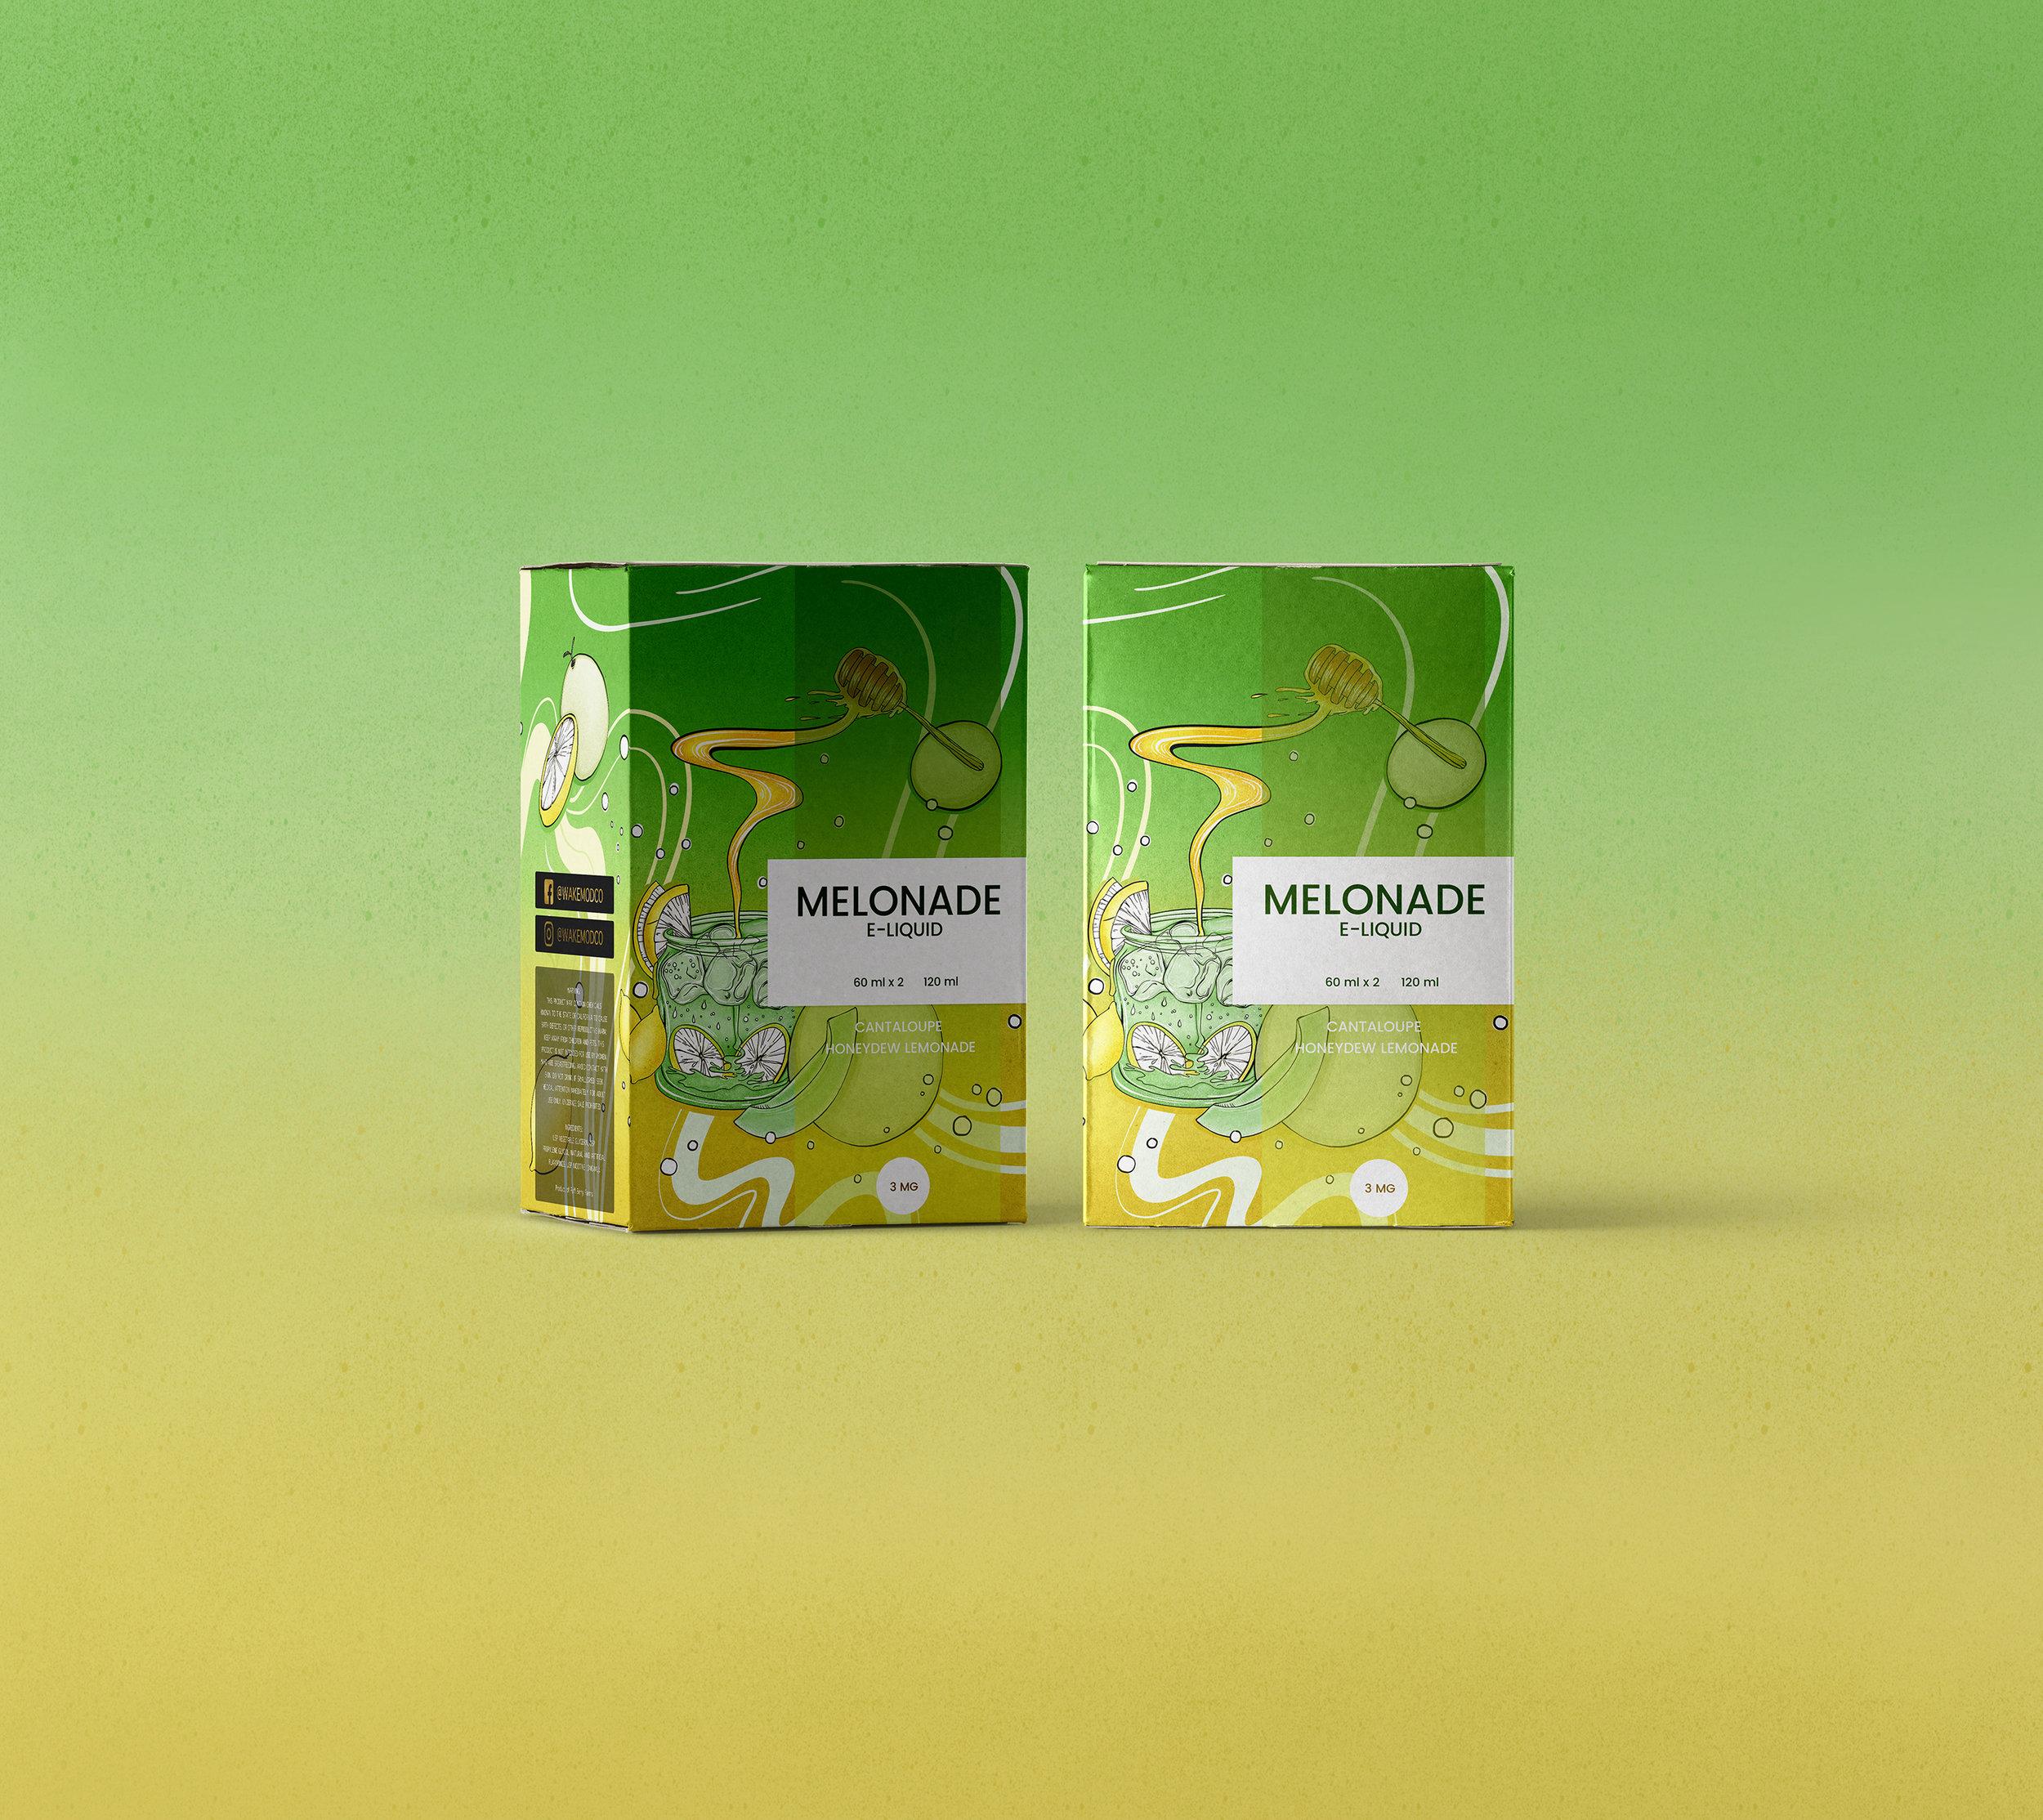 Melonade: Cantaloupe &Honeydew lemonade